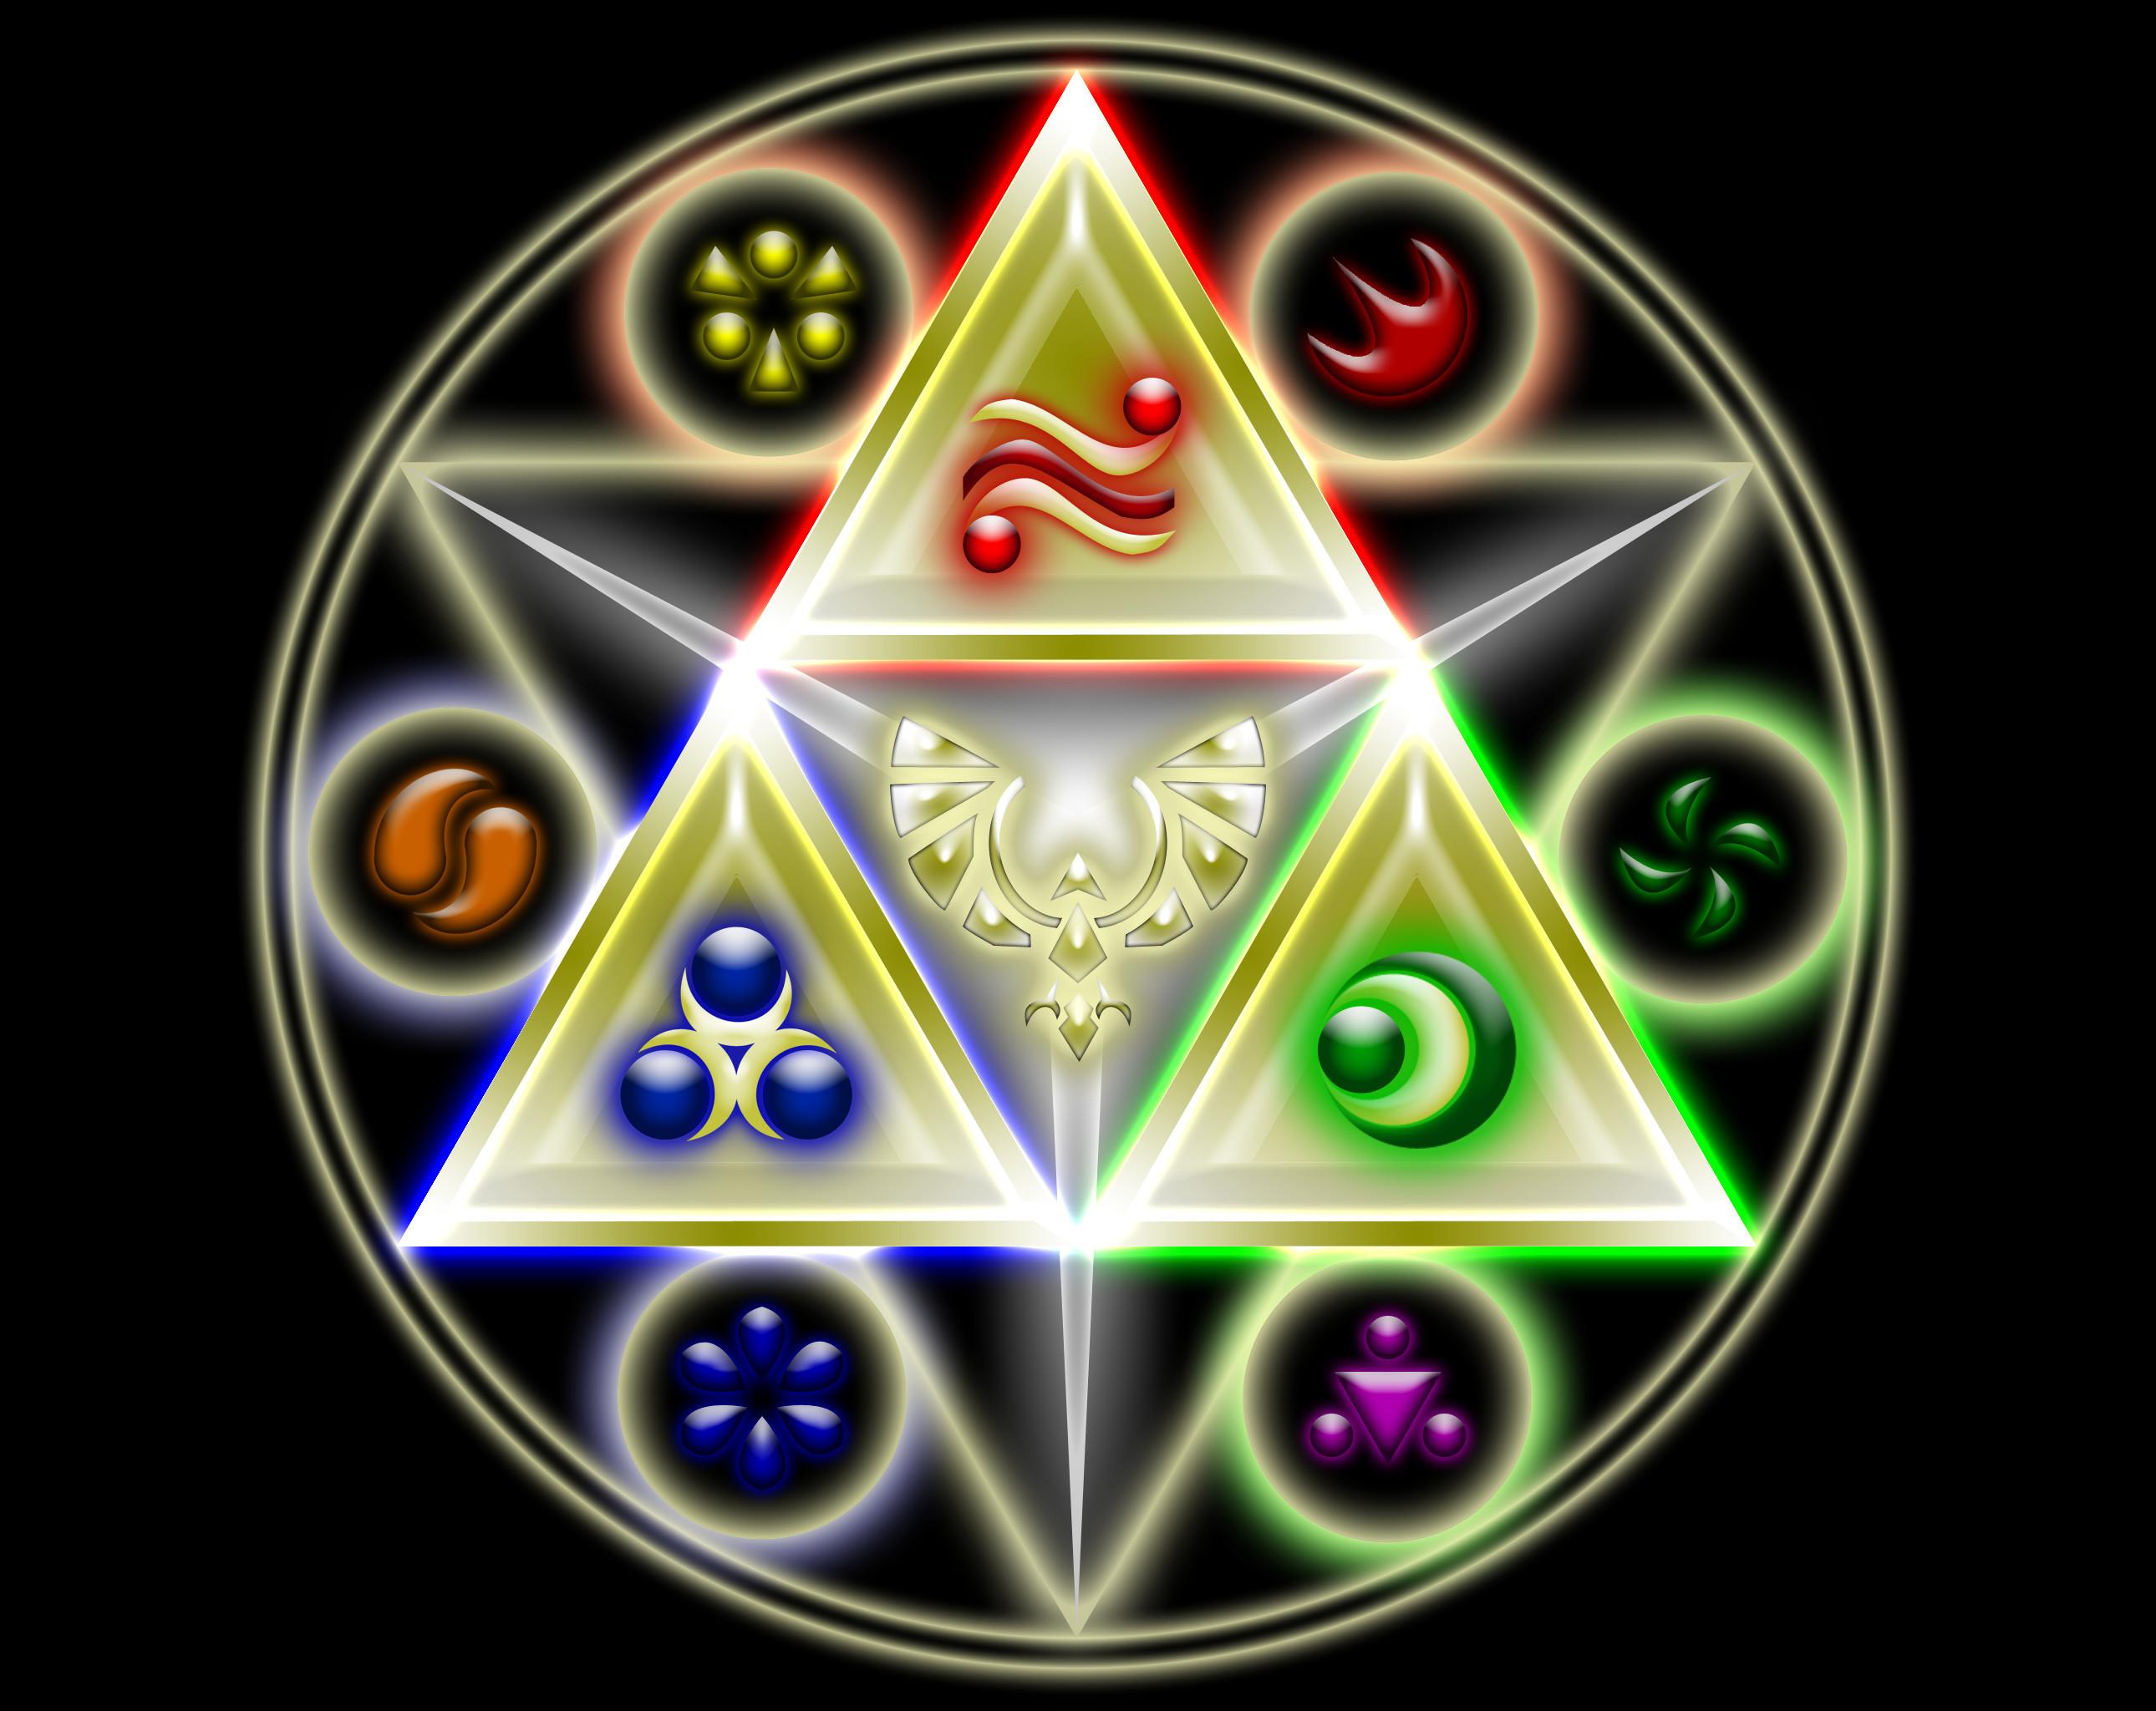 Res: 2580x2048,  Legend Of Zelda Tattoo Ideas | Triforce Wallpaper Hd